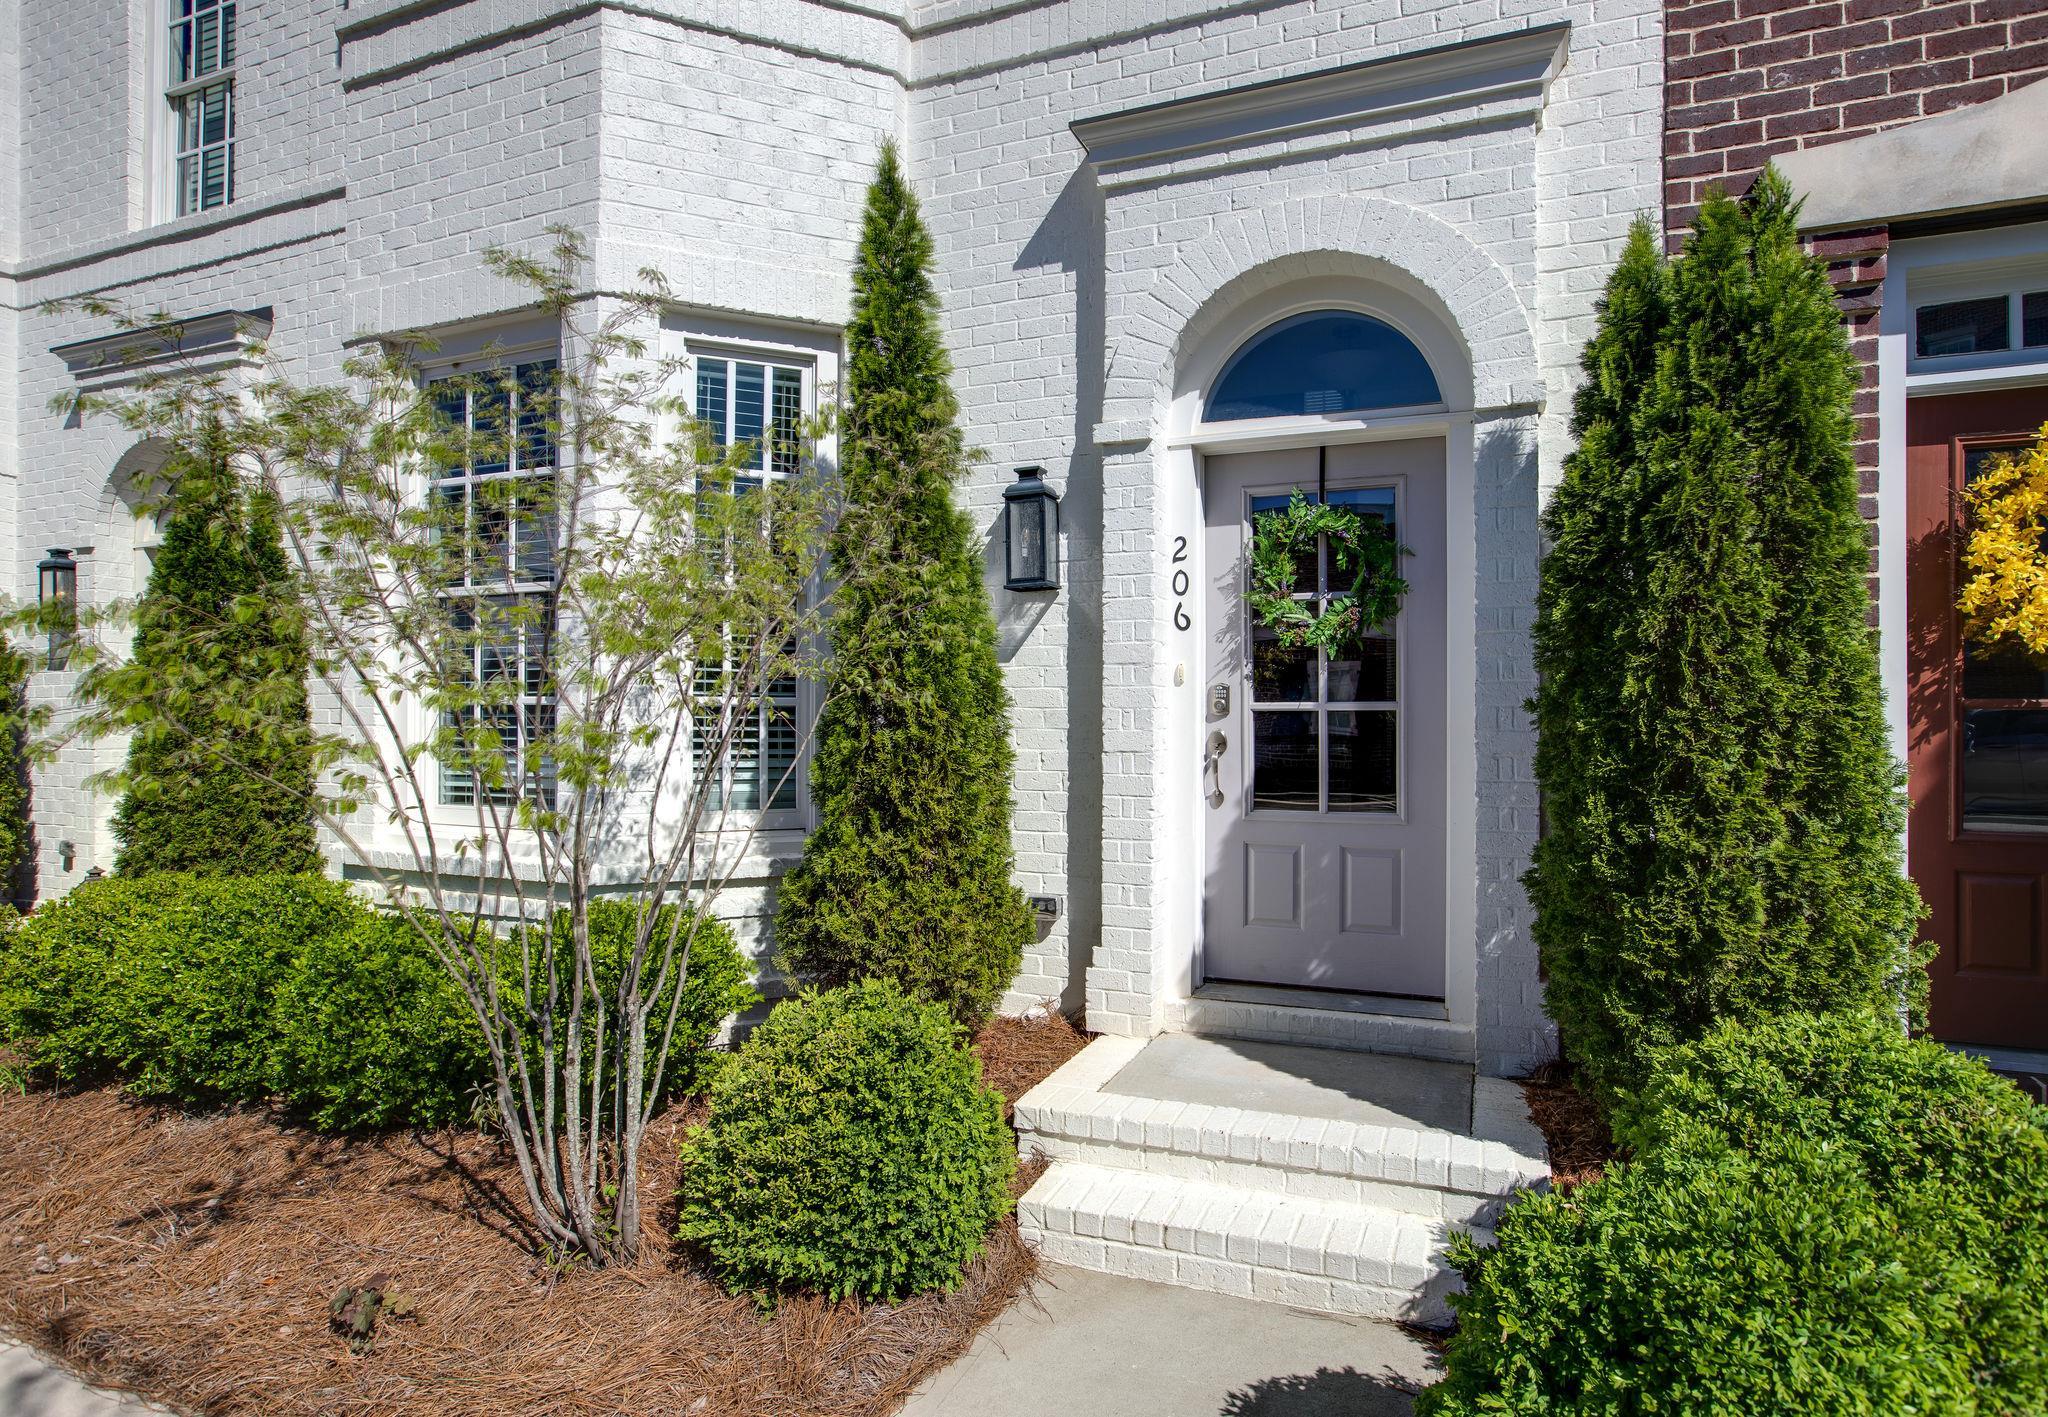 206 Mary Webb St, Franklin, TN 37064 - Franklin, TN real estate listing